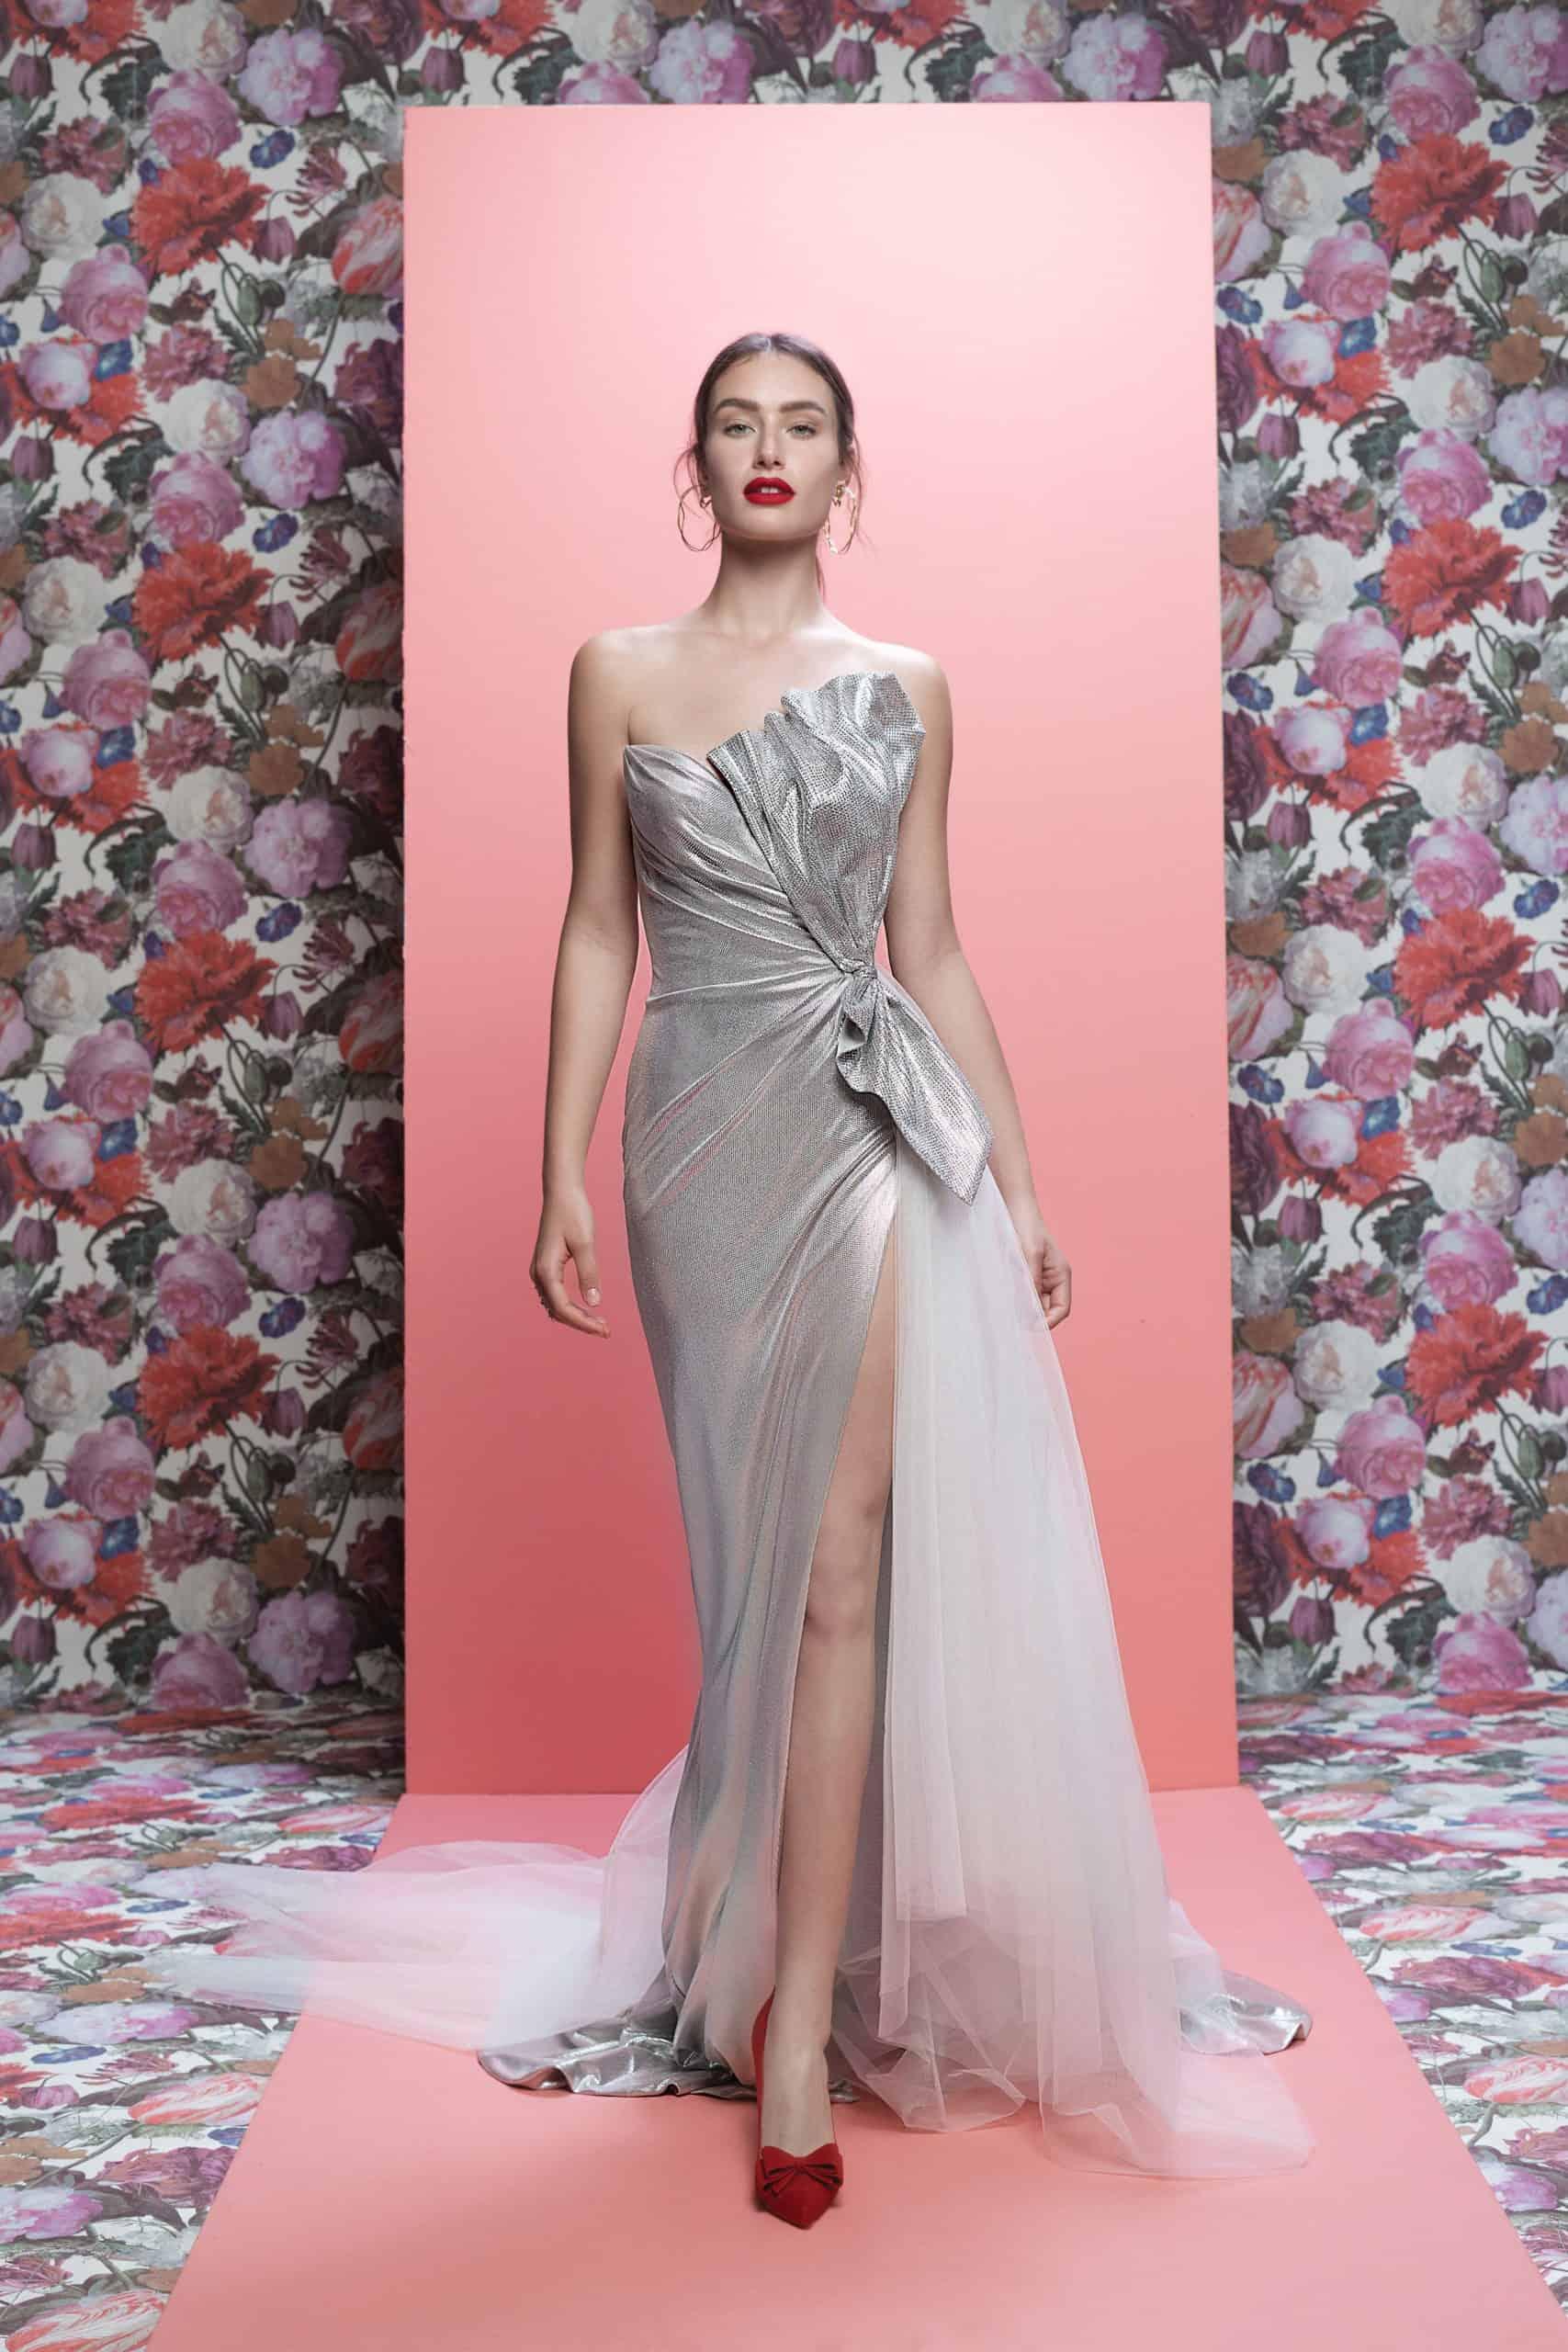 metallic wedding dress with a bow by Galia Lahav